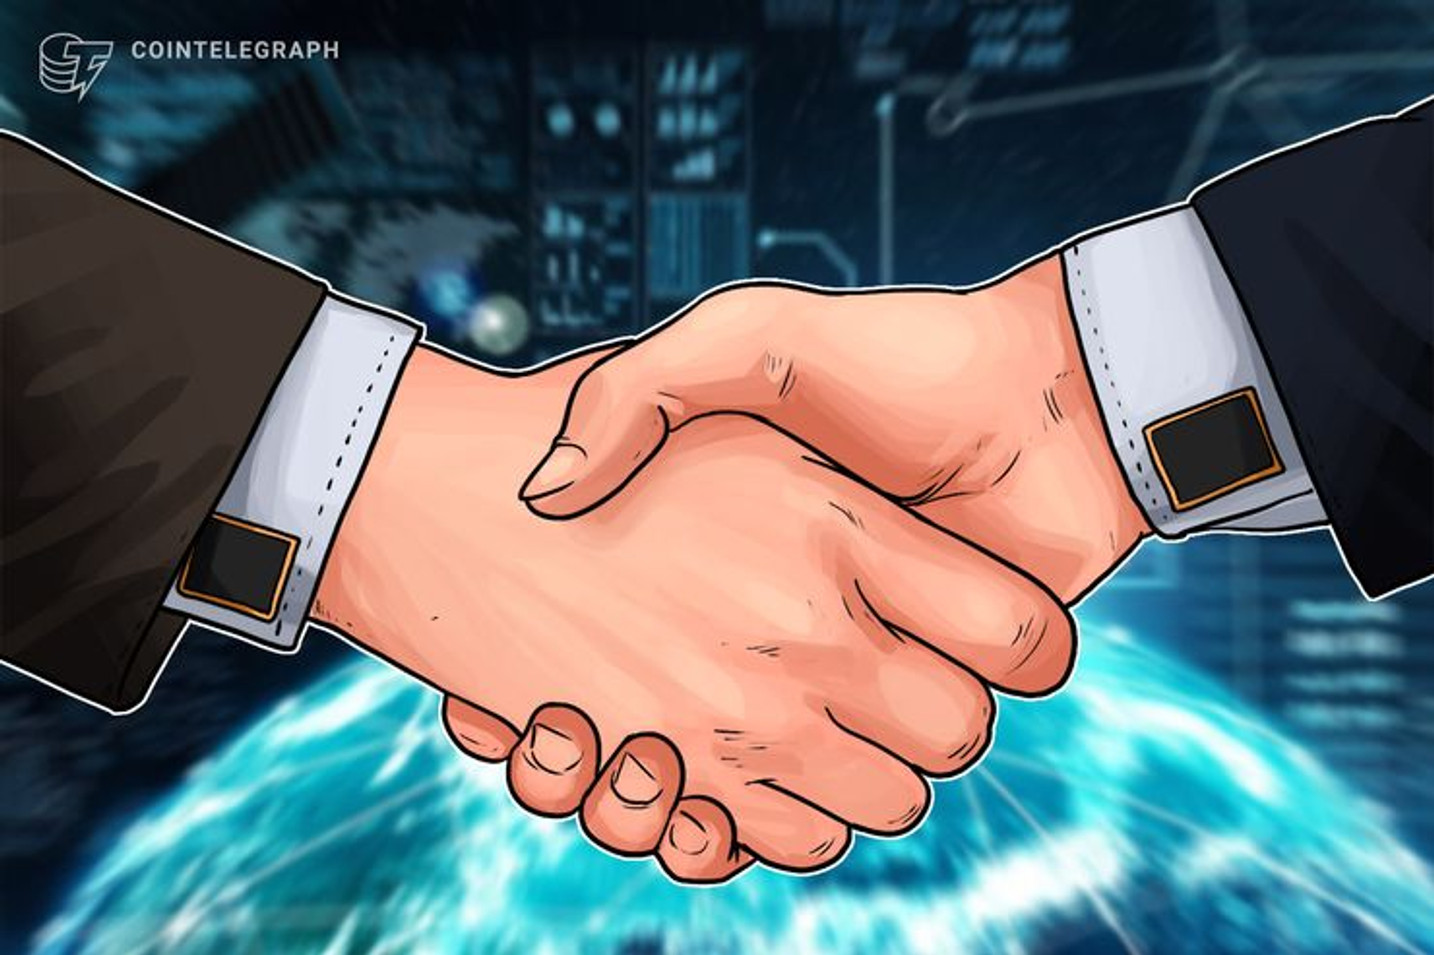 España: Blockchain Aragon se incorpora a la Alianza Blockchain Iberoamérica